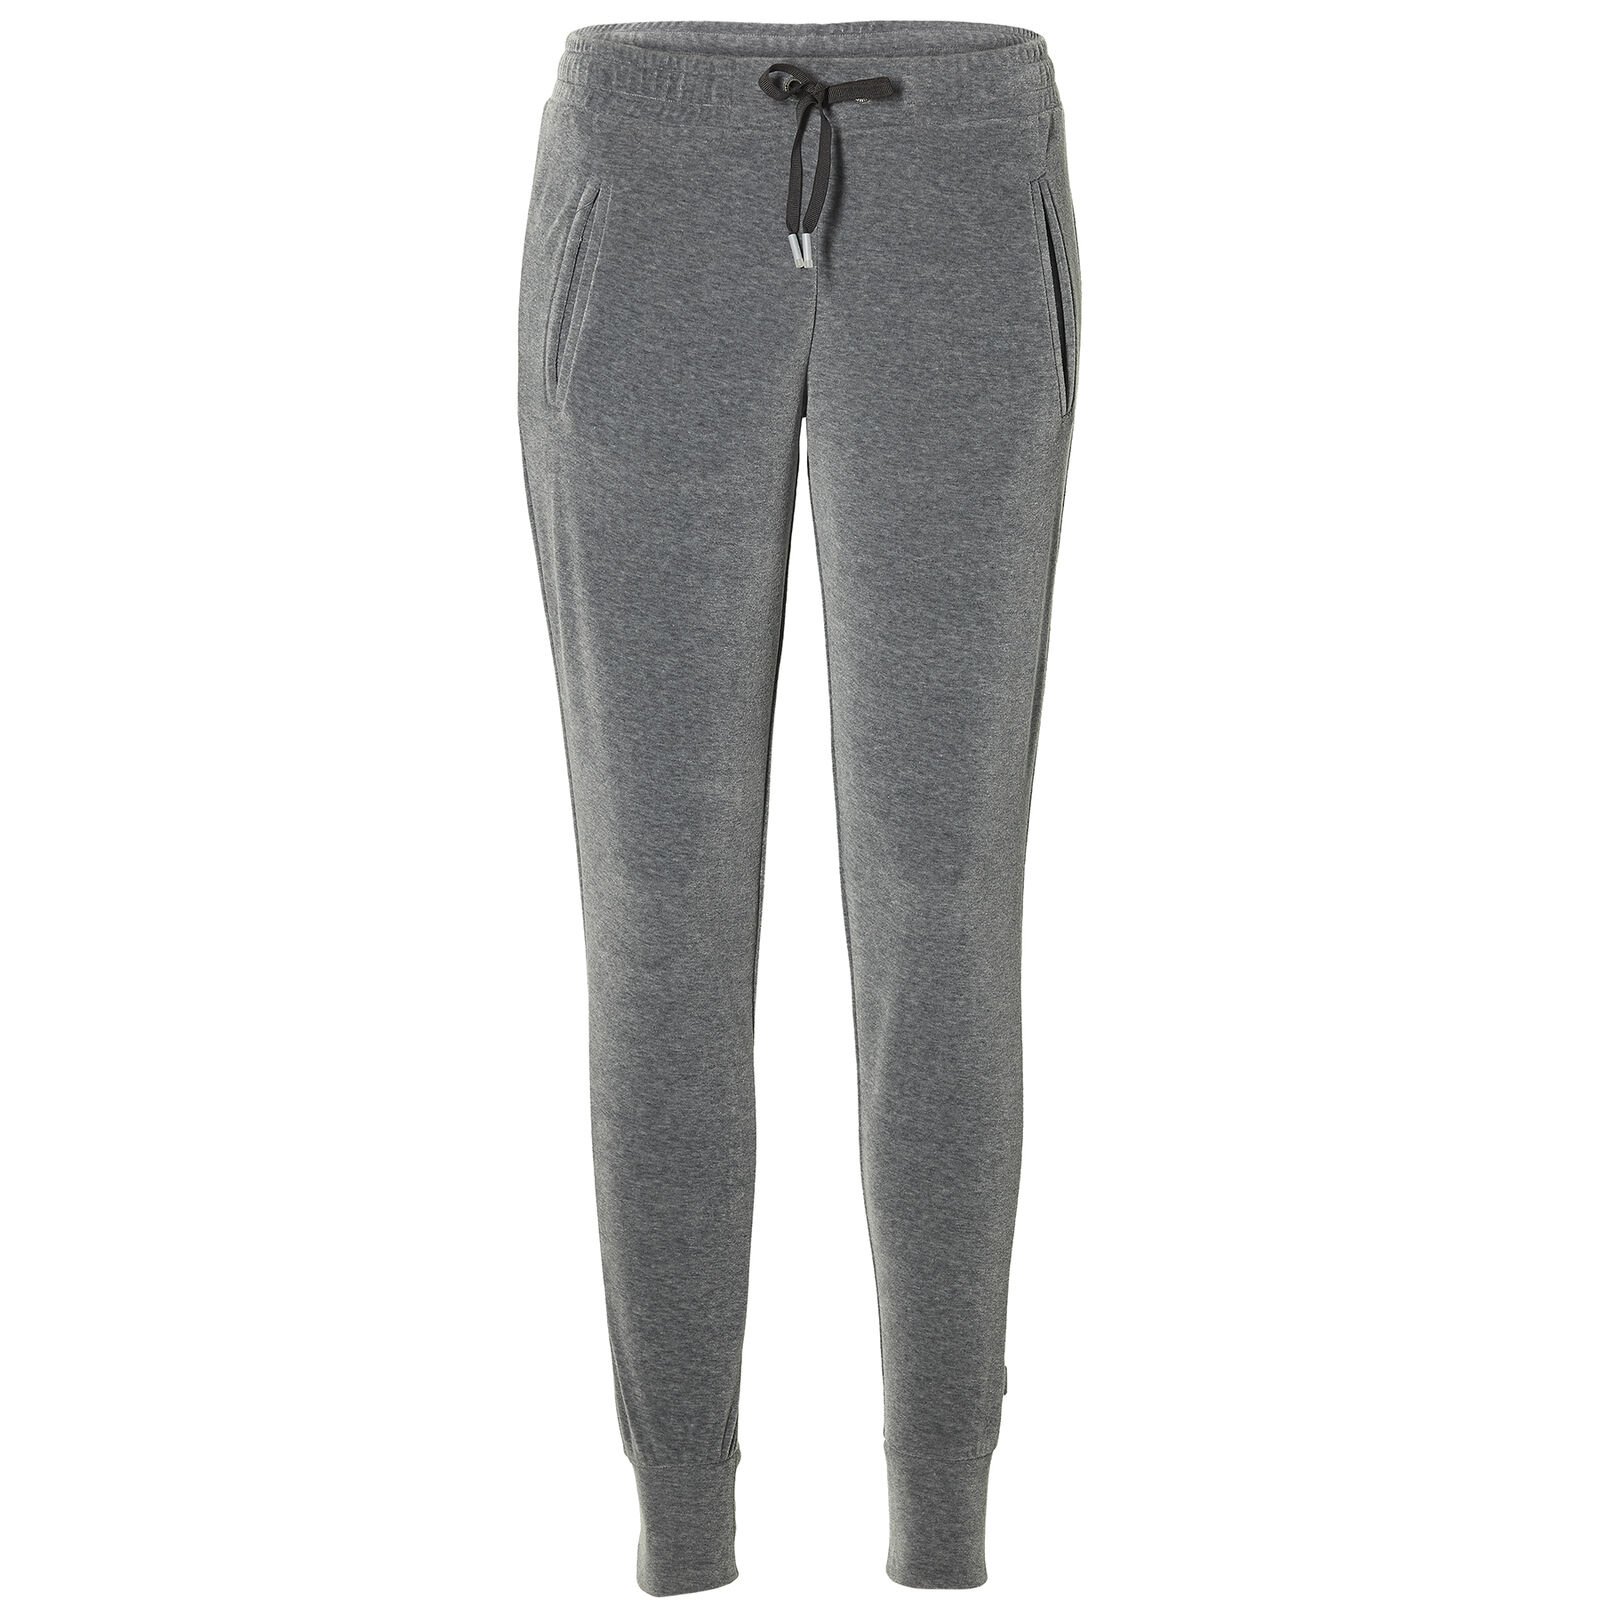 O'Neill Sweathose Trousers LW Velour Jogger Hose grau Plain All